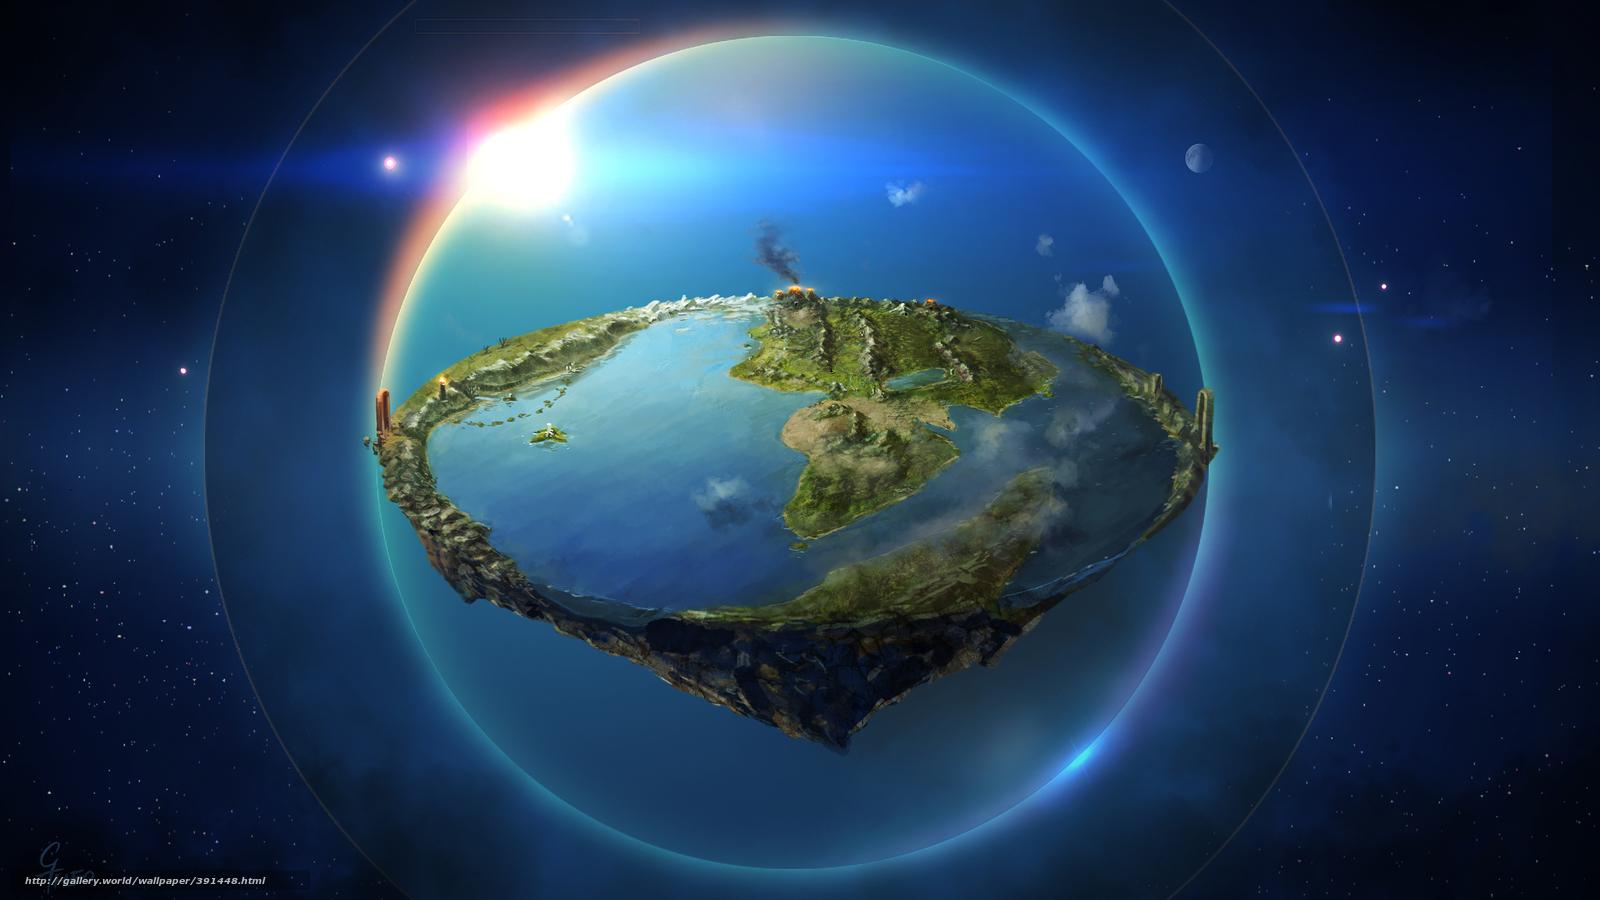 Ambarkanta shape of the world map three epochs arda middle ambarkanta shape of the world map three epochs arda middle earth land lord of the rings the silmarillion jrr tolkien fantasy 391448 gumiabroncs Gallery